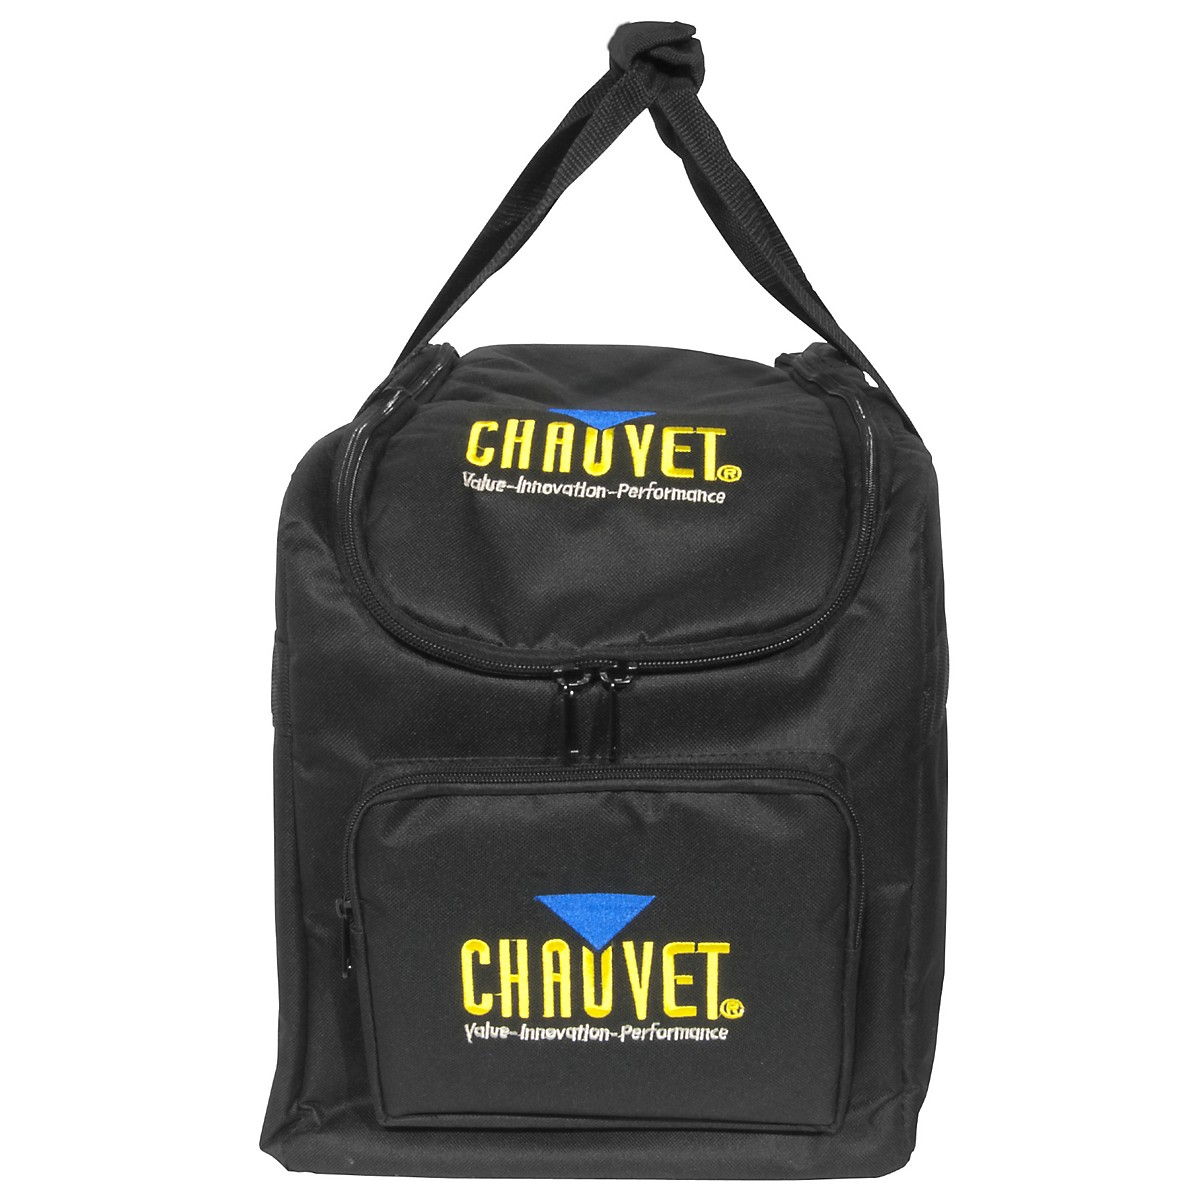 CHAUVET DJ CHS-30 VIP Gear Bag for SlimPAR LED Lights